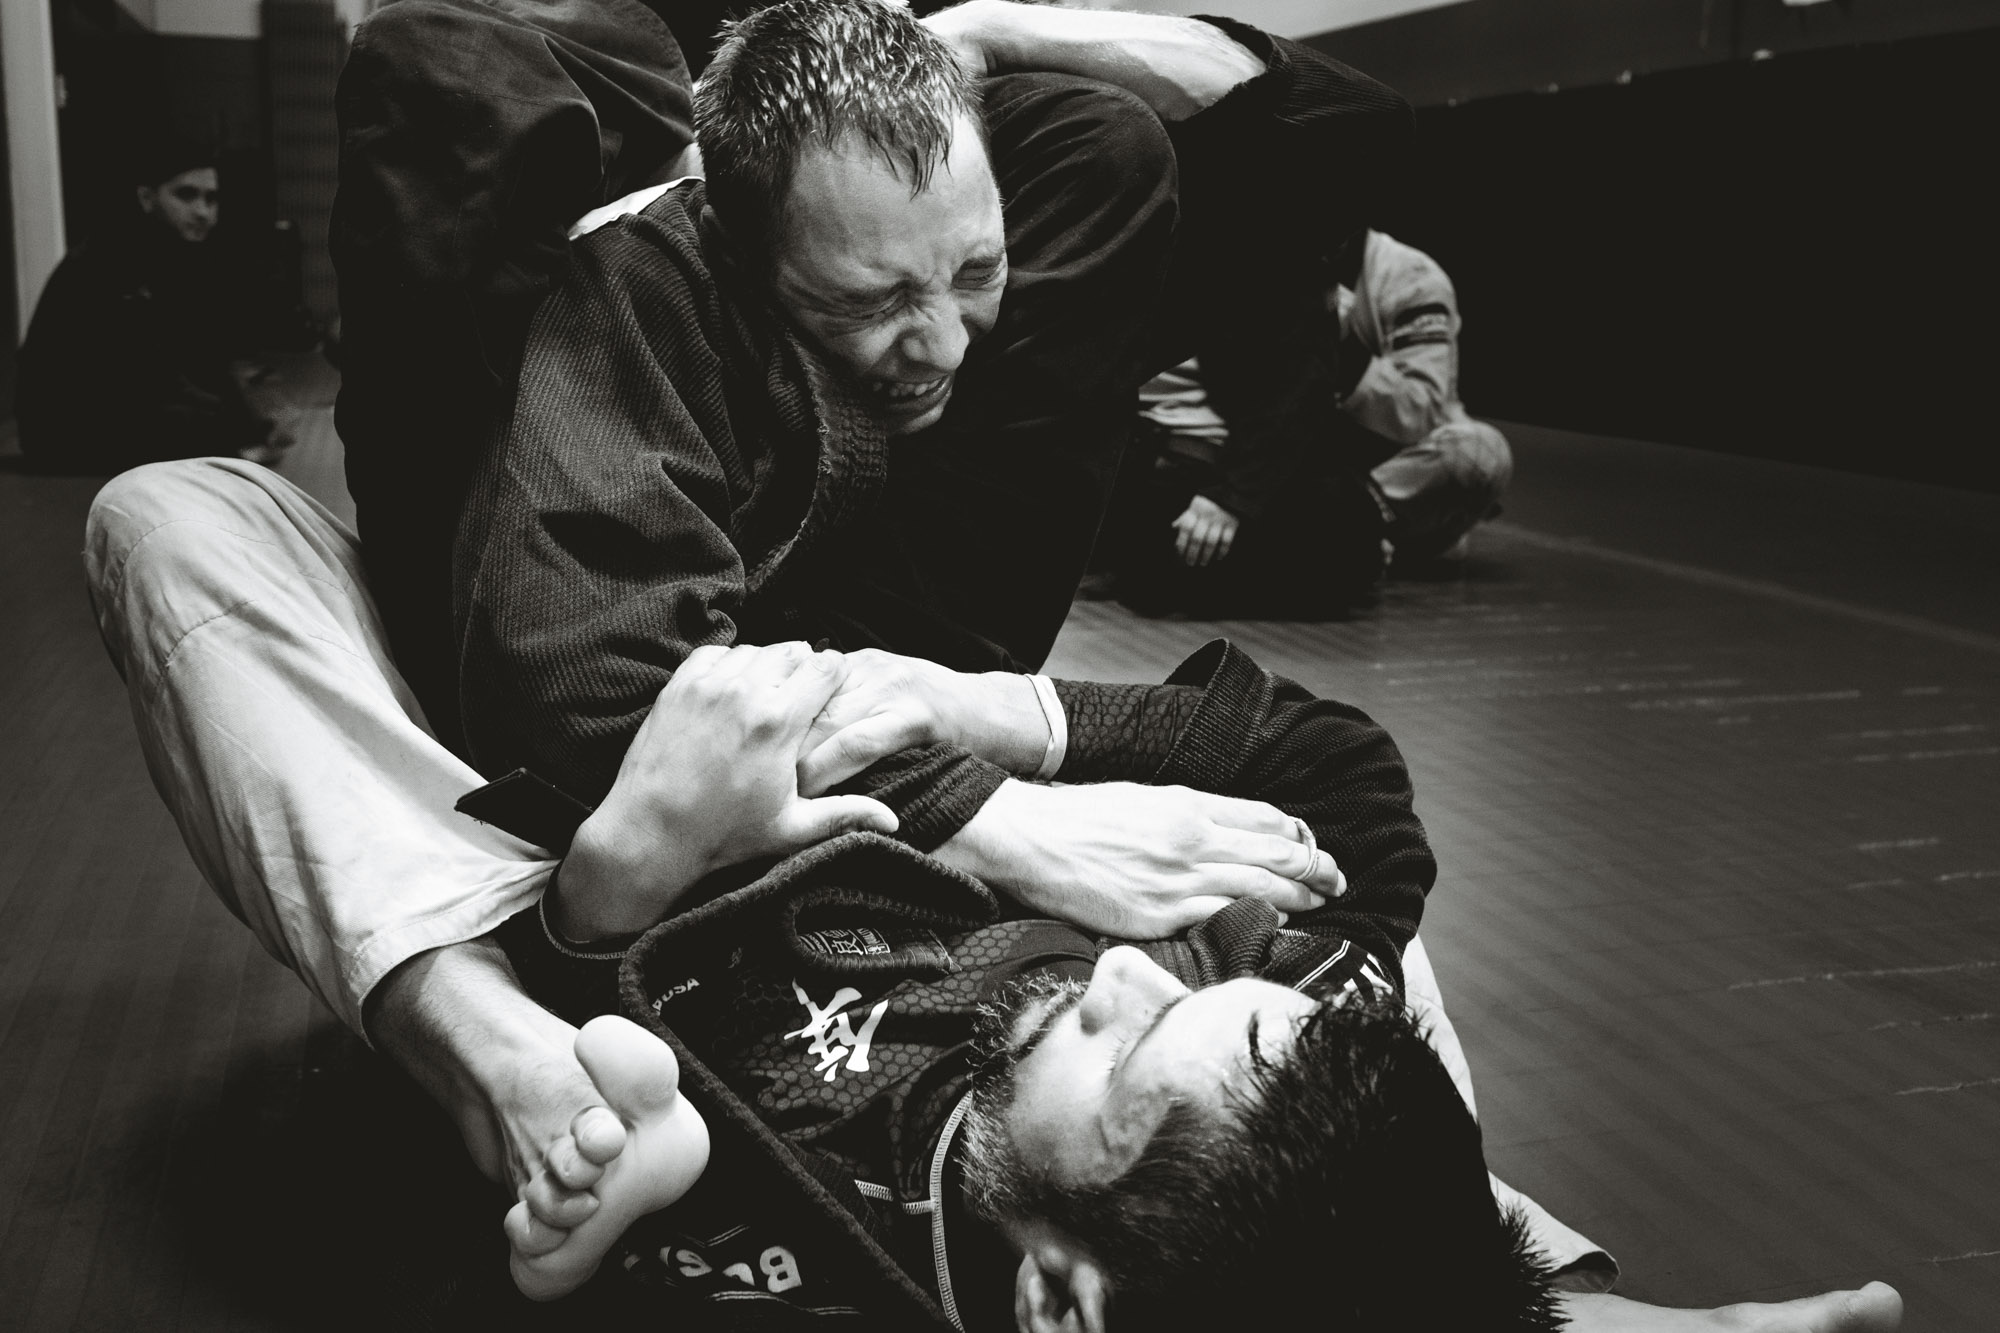 Juan Arreguin triangle chokes Cooper